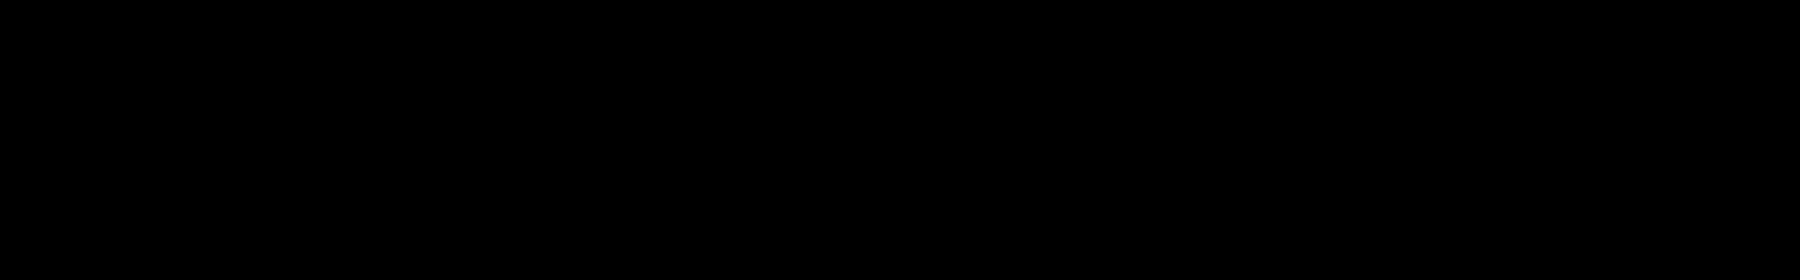 Vibras Reggaeton audio waveform